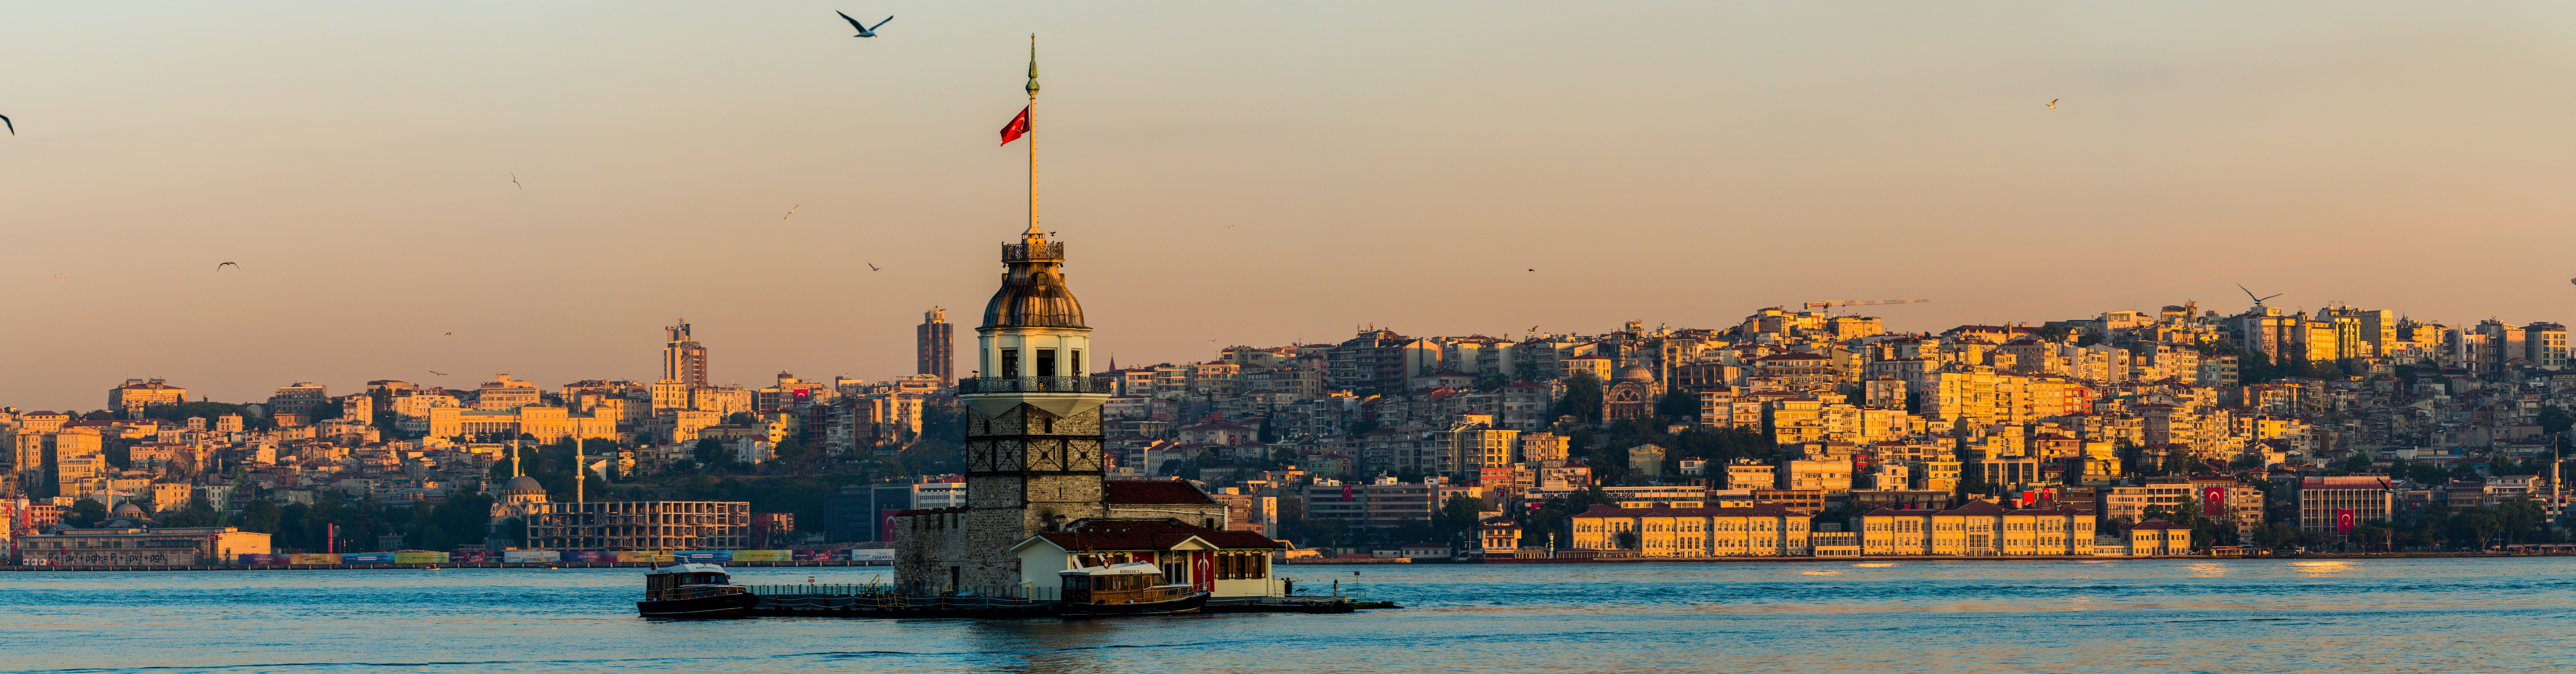 Maidens Tower, Istanbul, Turecko, bocne svetlo, vychod slnka, panorama